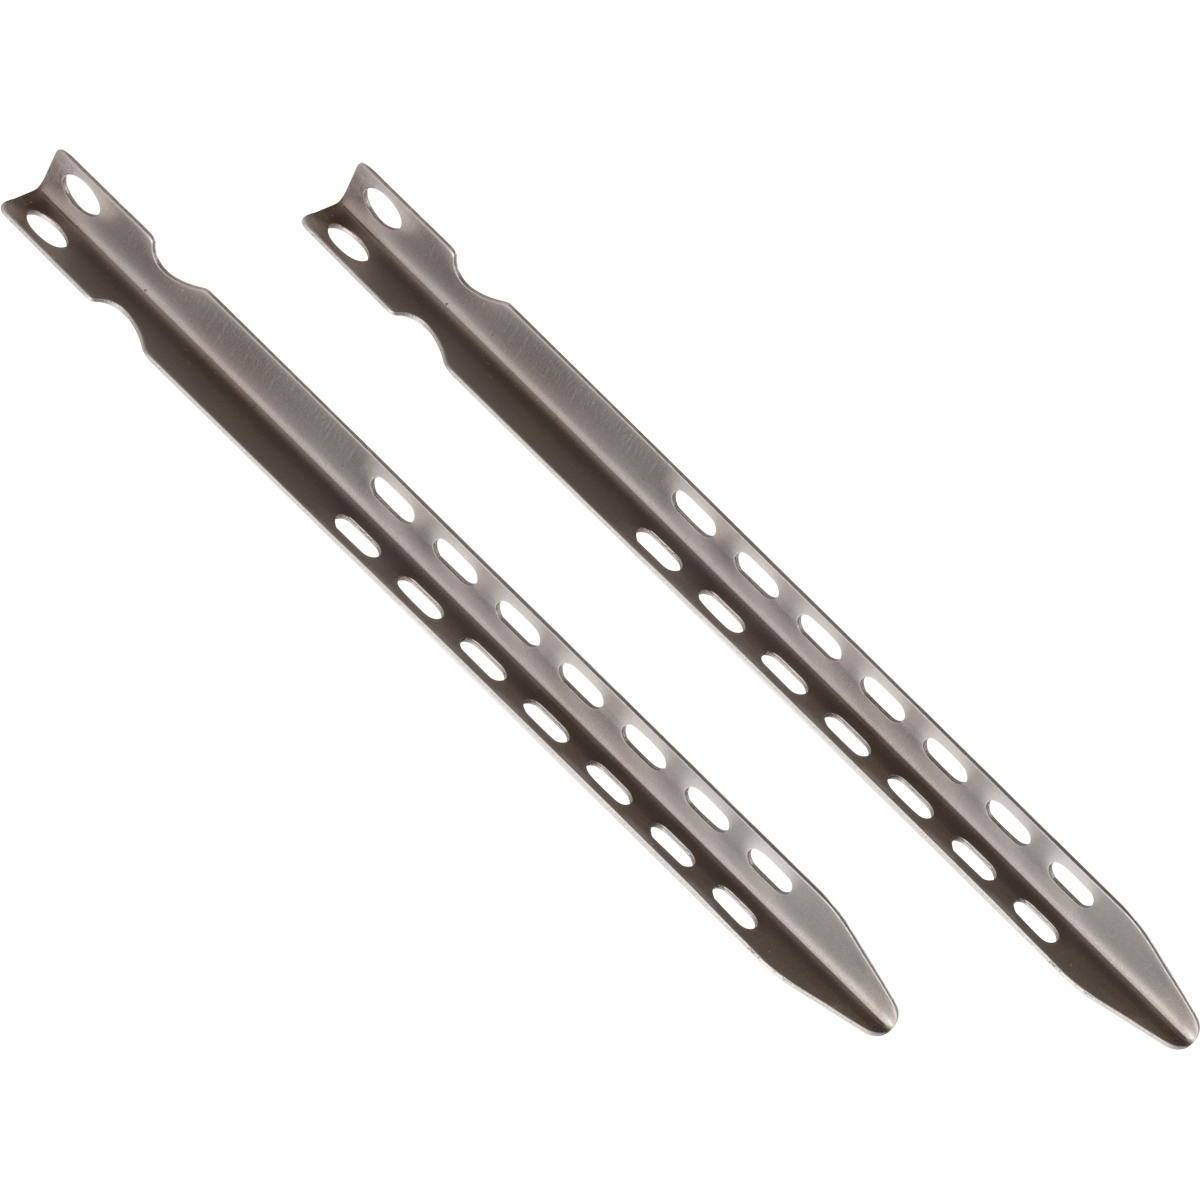 Nordisk Titanium V Peg 9 - Heringe